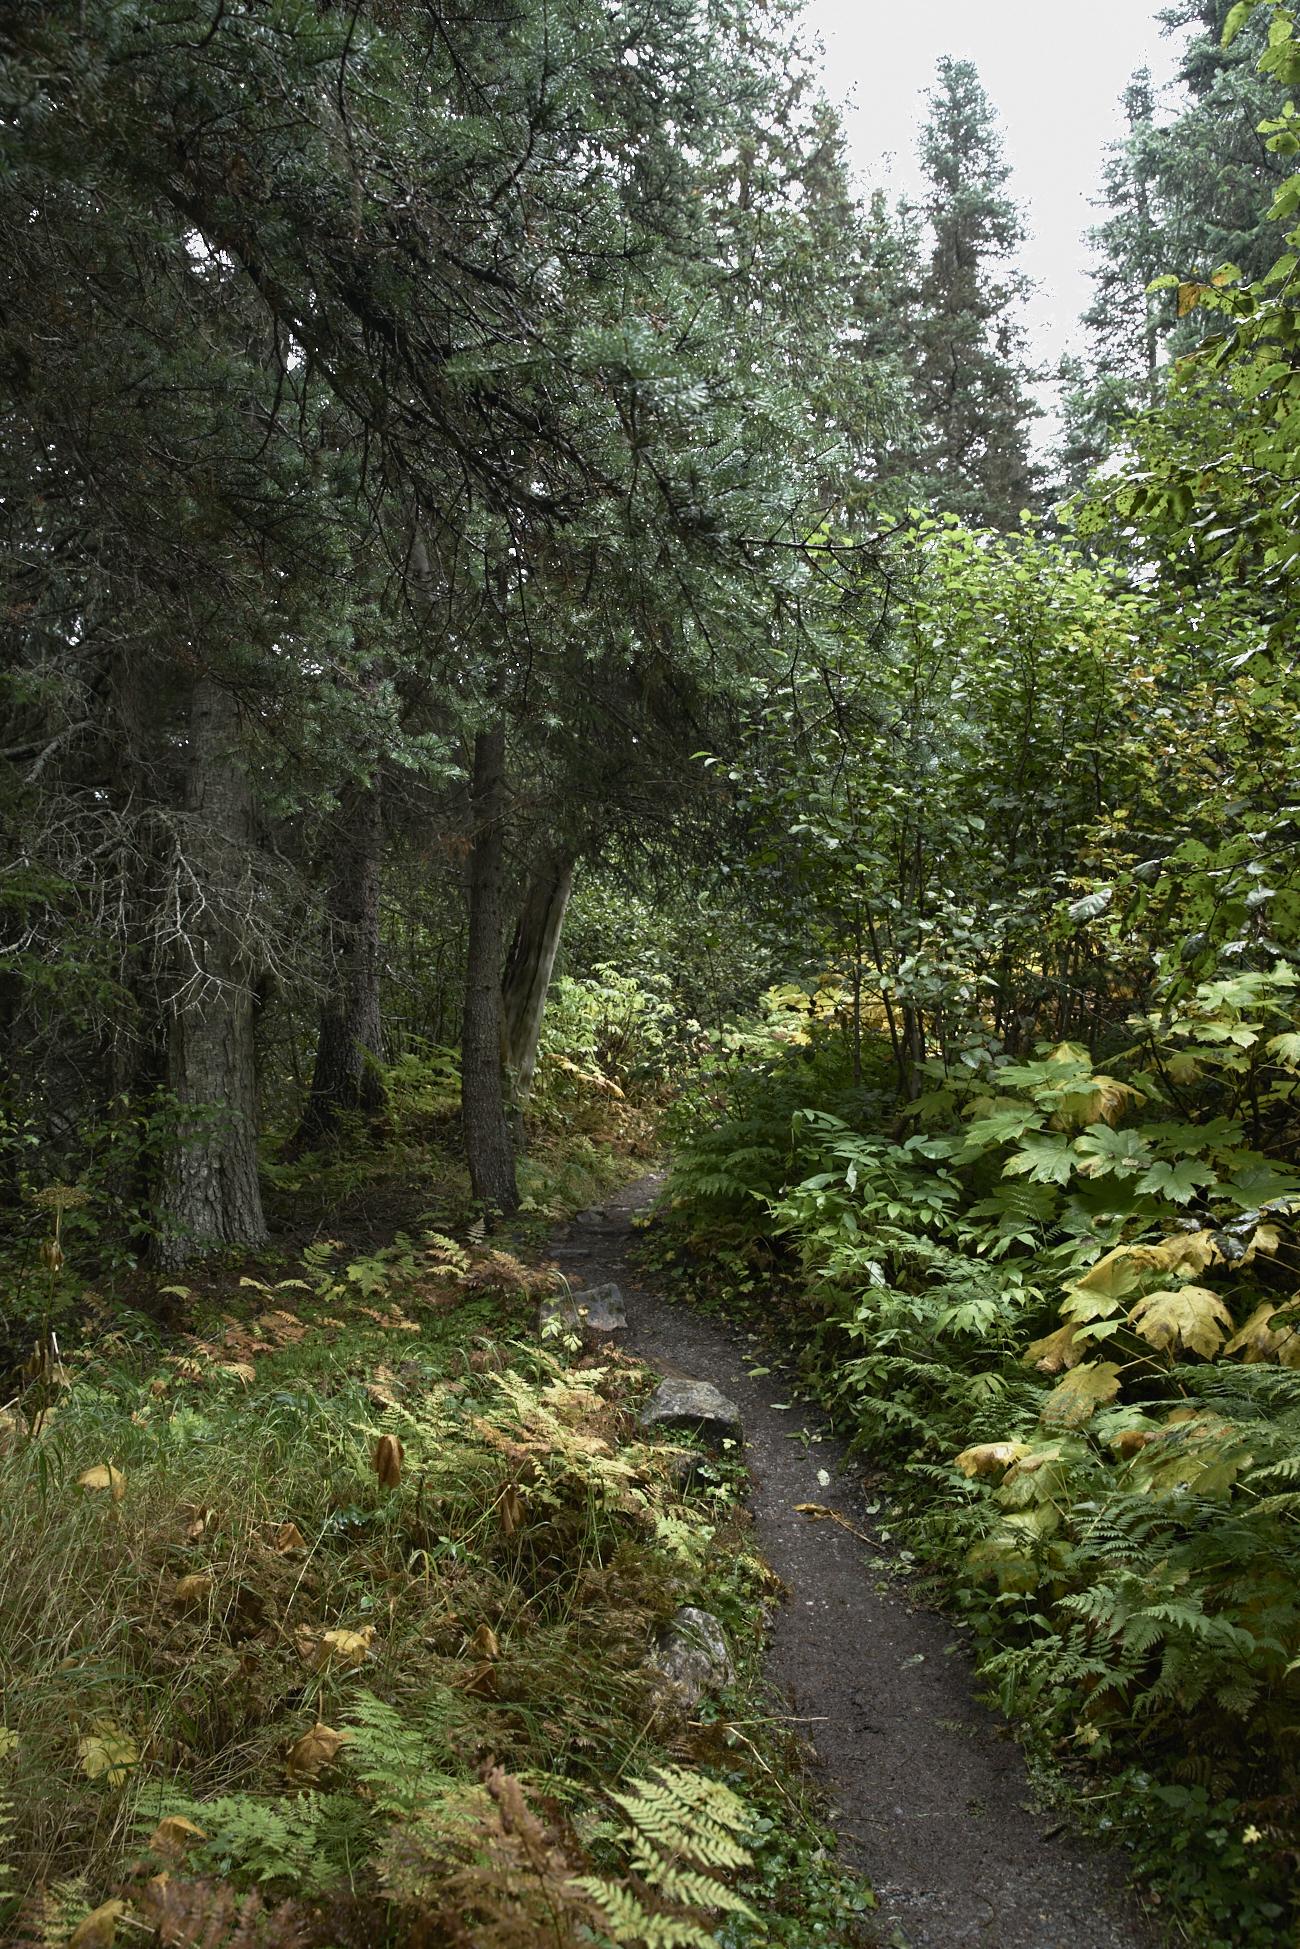 Shore excursions - Skagway Alaska, Hiking, Helicopter, White Pass & Yukon Route Railroad /